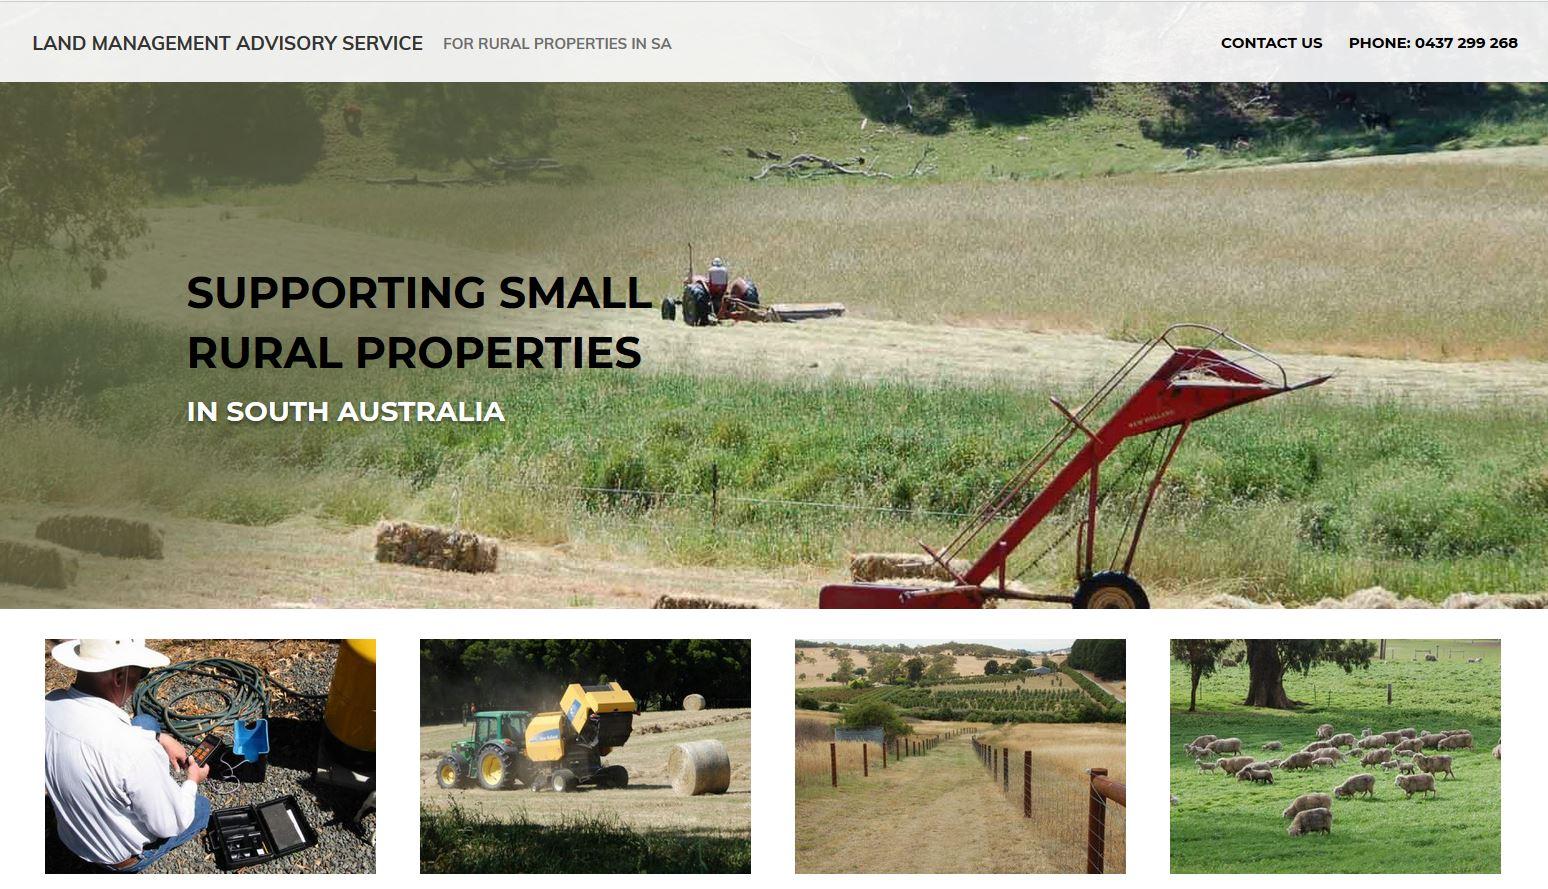 Website for Land Management Advisory Service